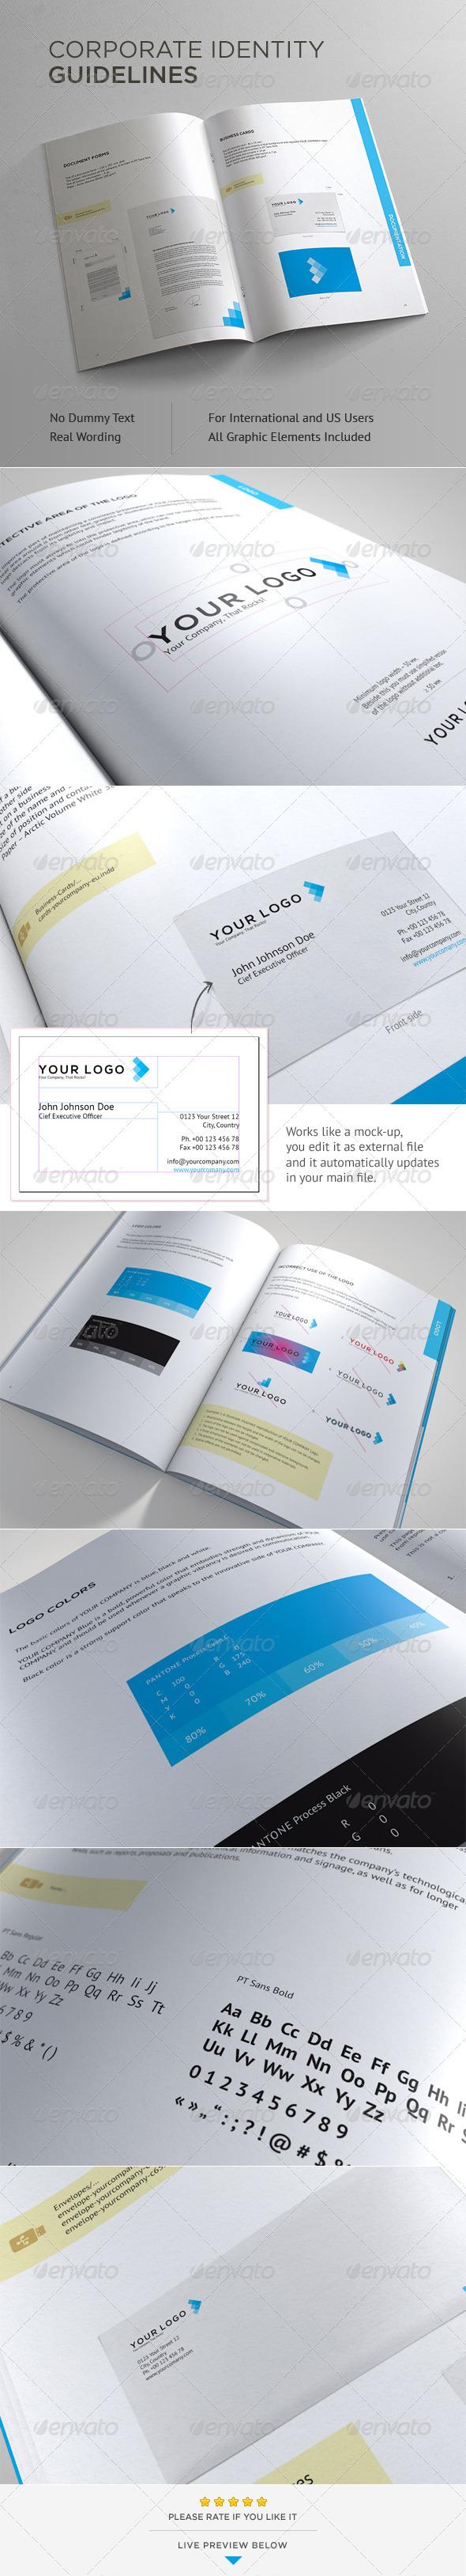 GraphicRiver Corporate Identity Guidelines 4583821